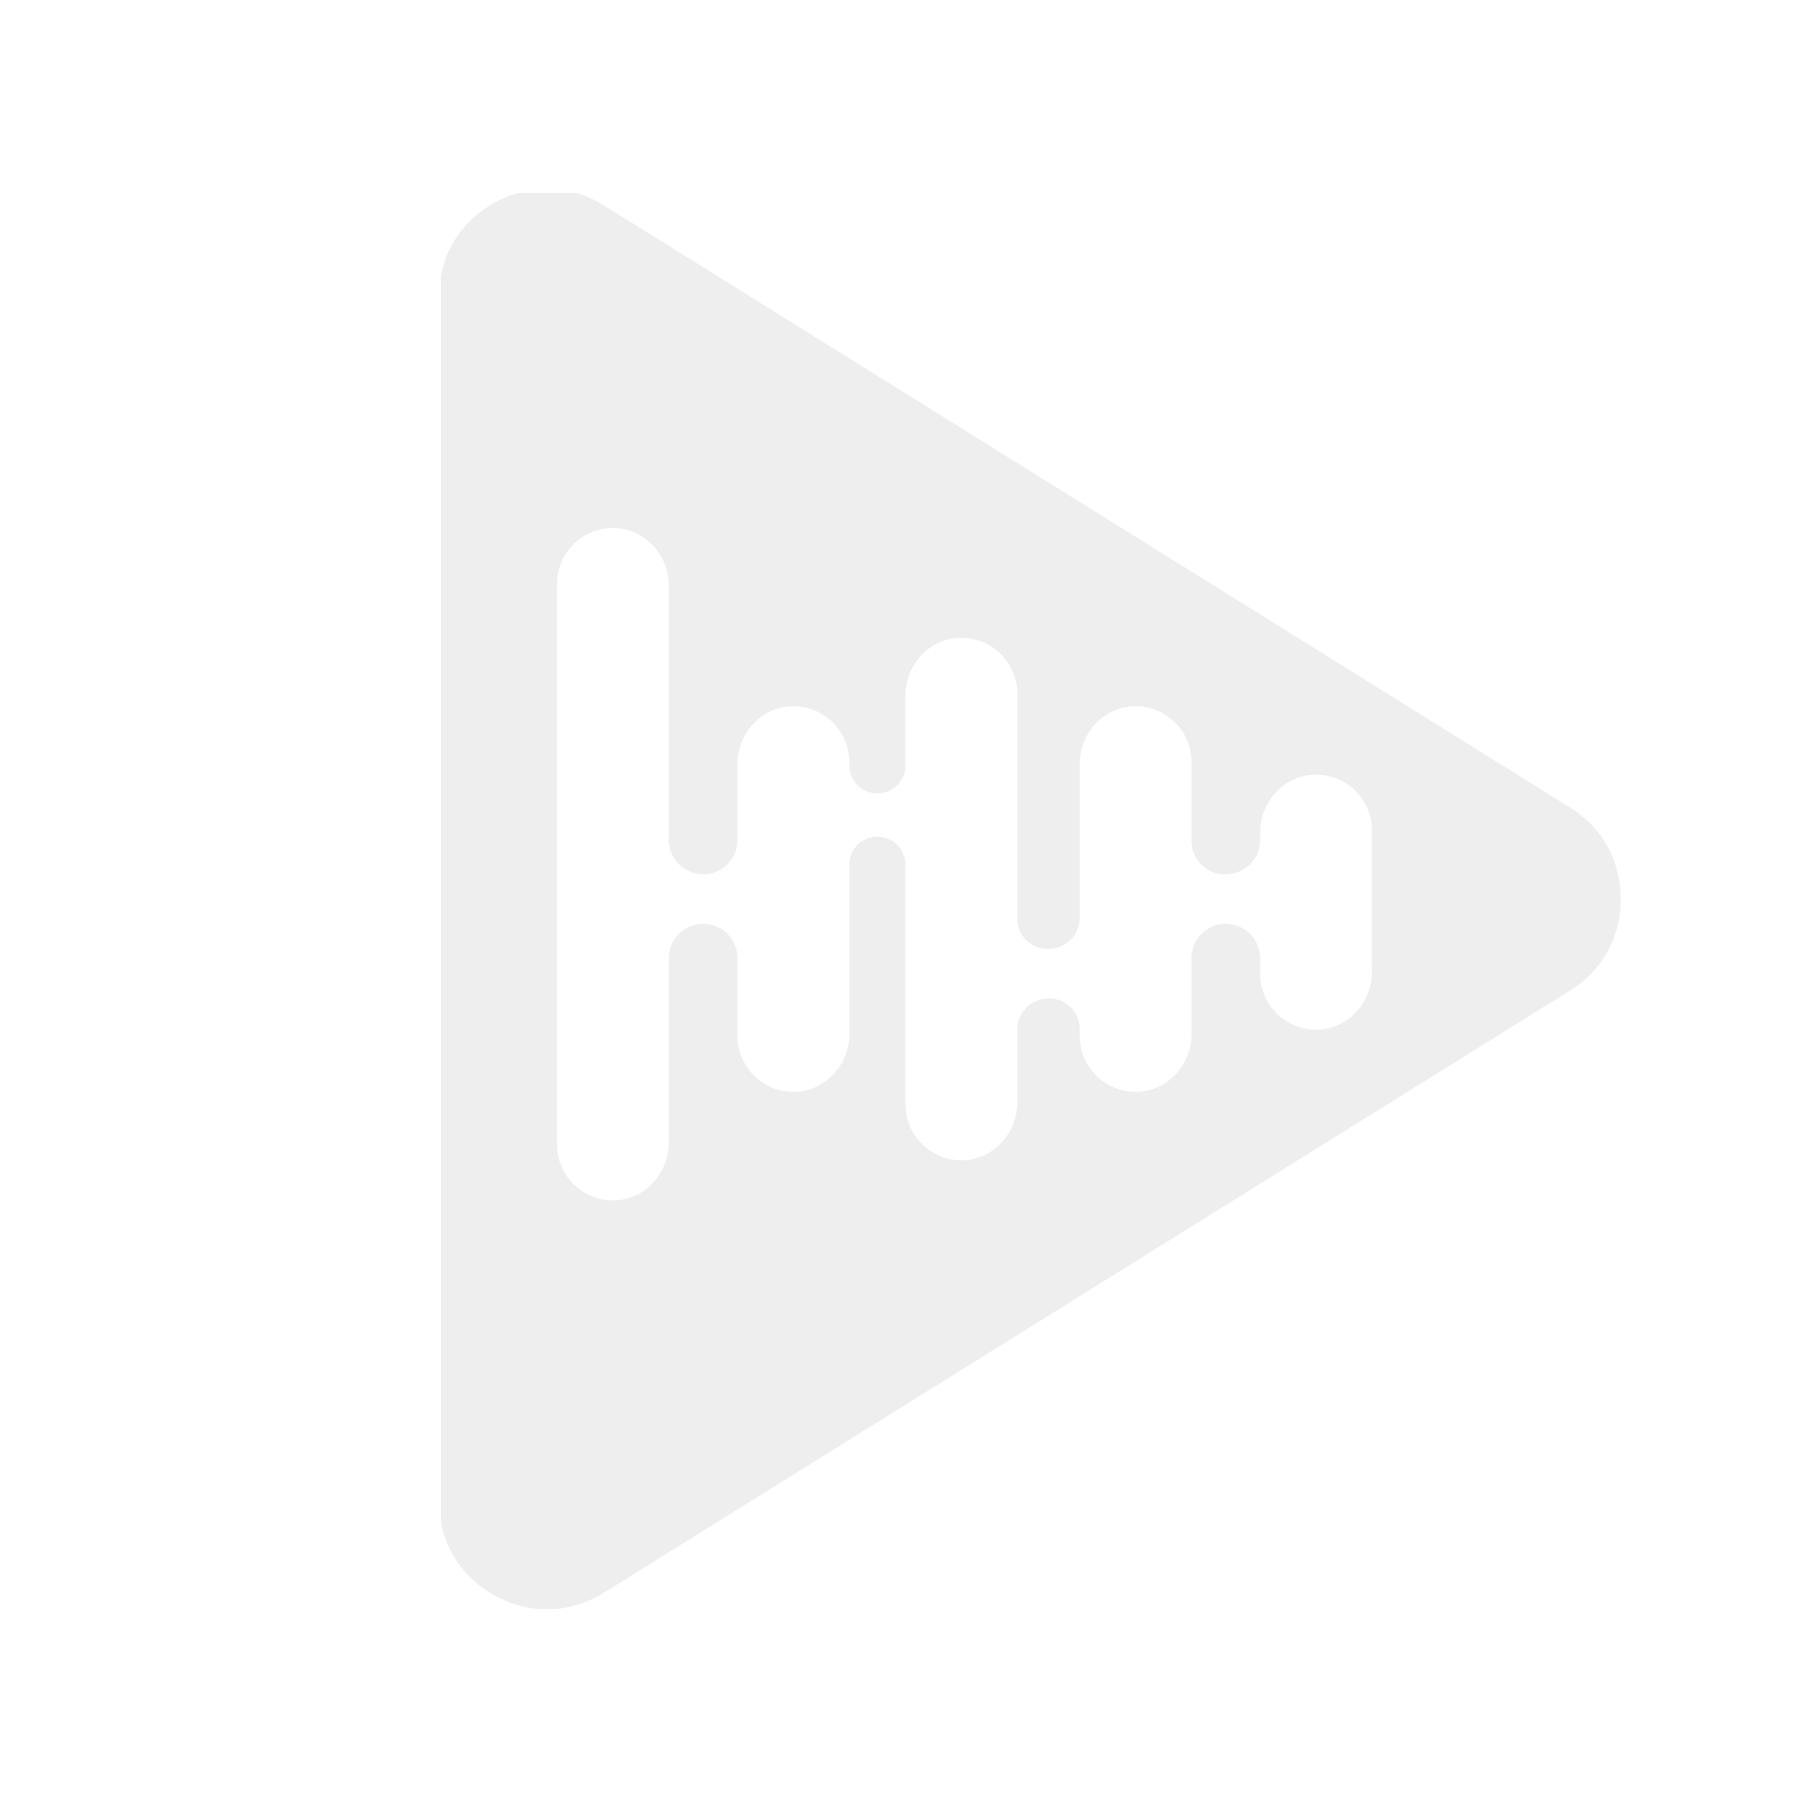 Klipsch 101181